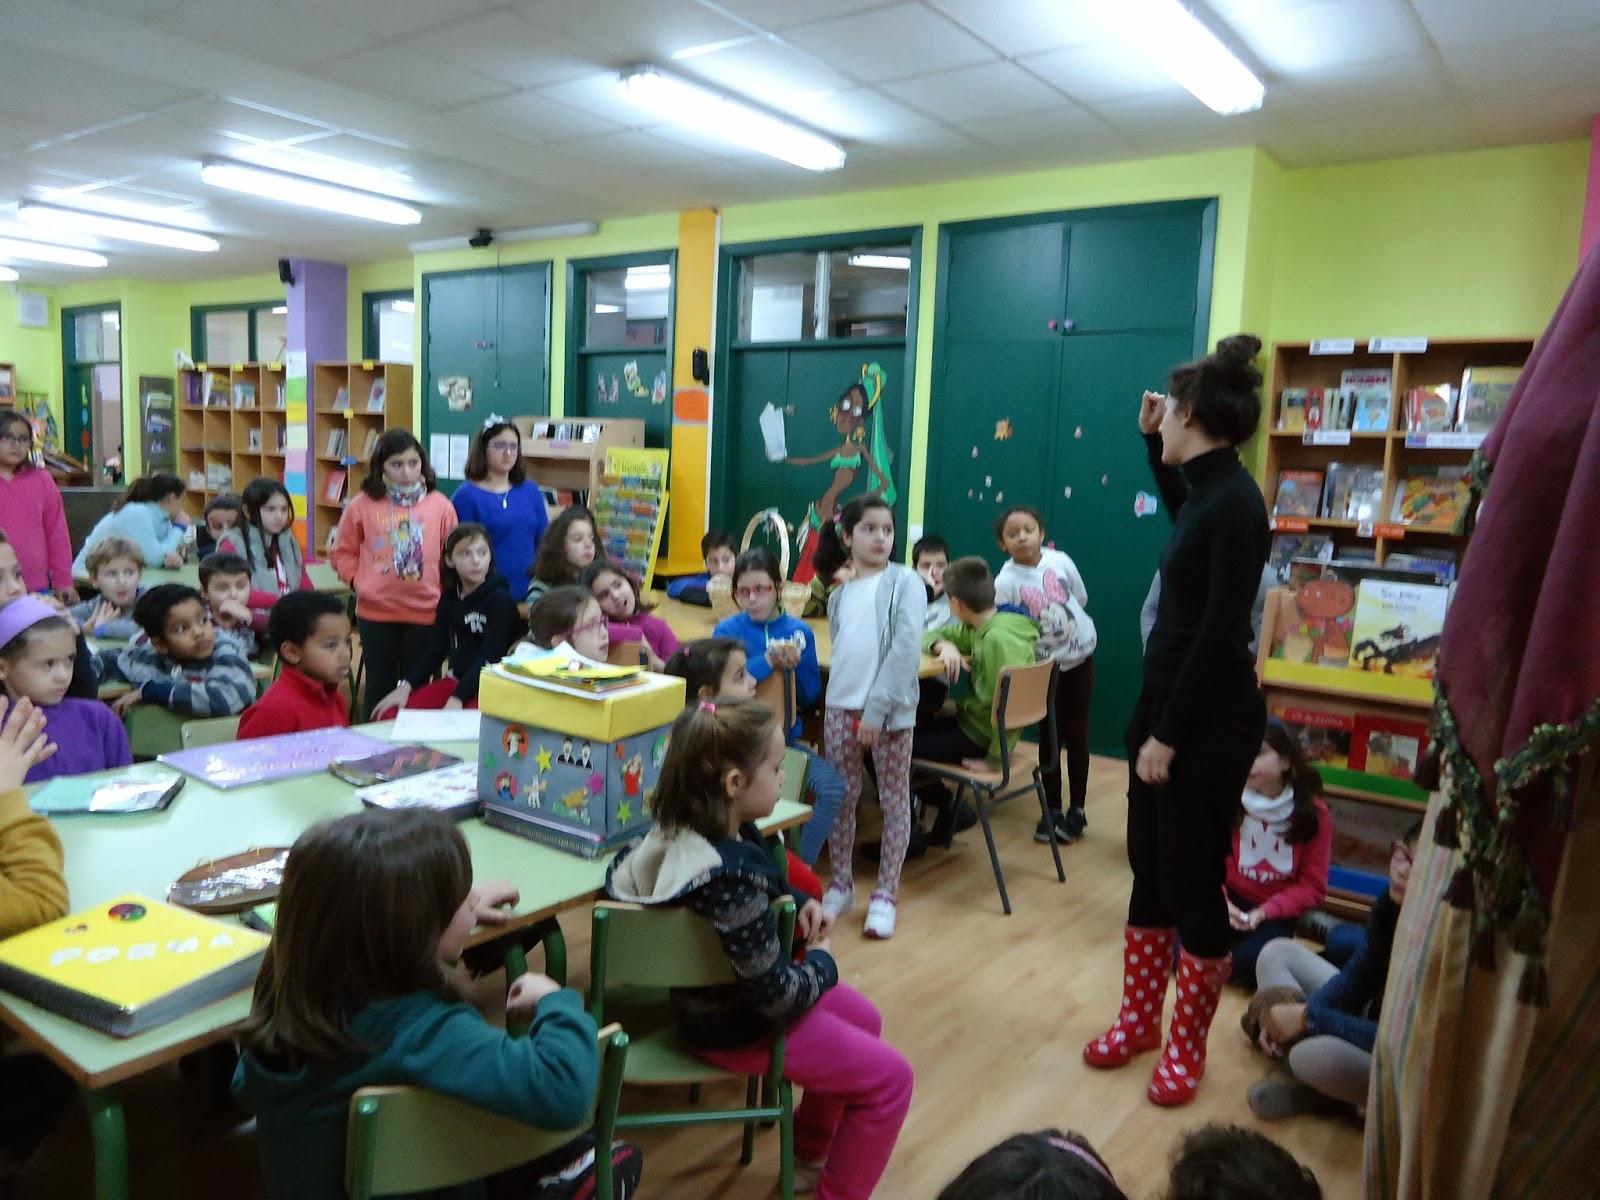 http://bibliotecadochouzo.blogspot.com.es/2014/02/taller-de-literatura-creativa.html